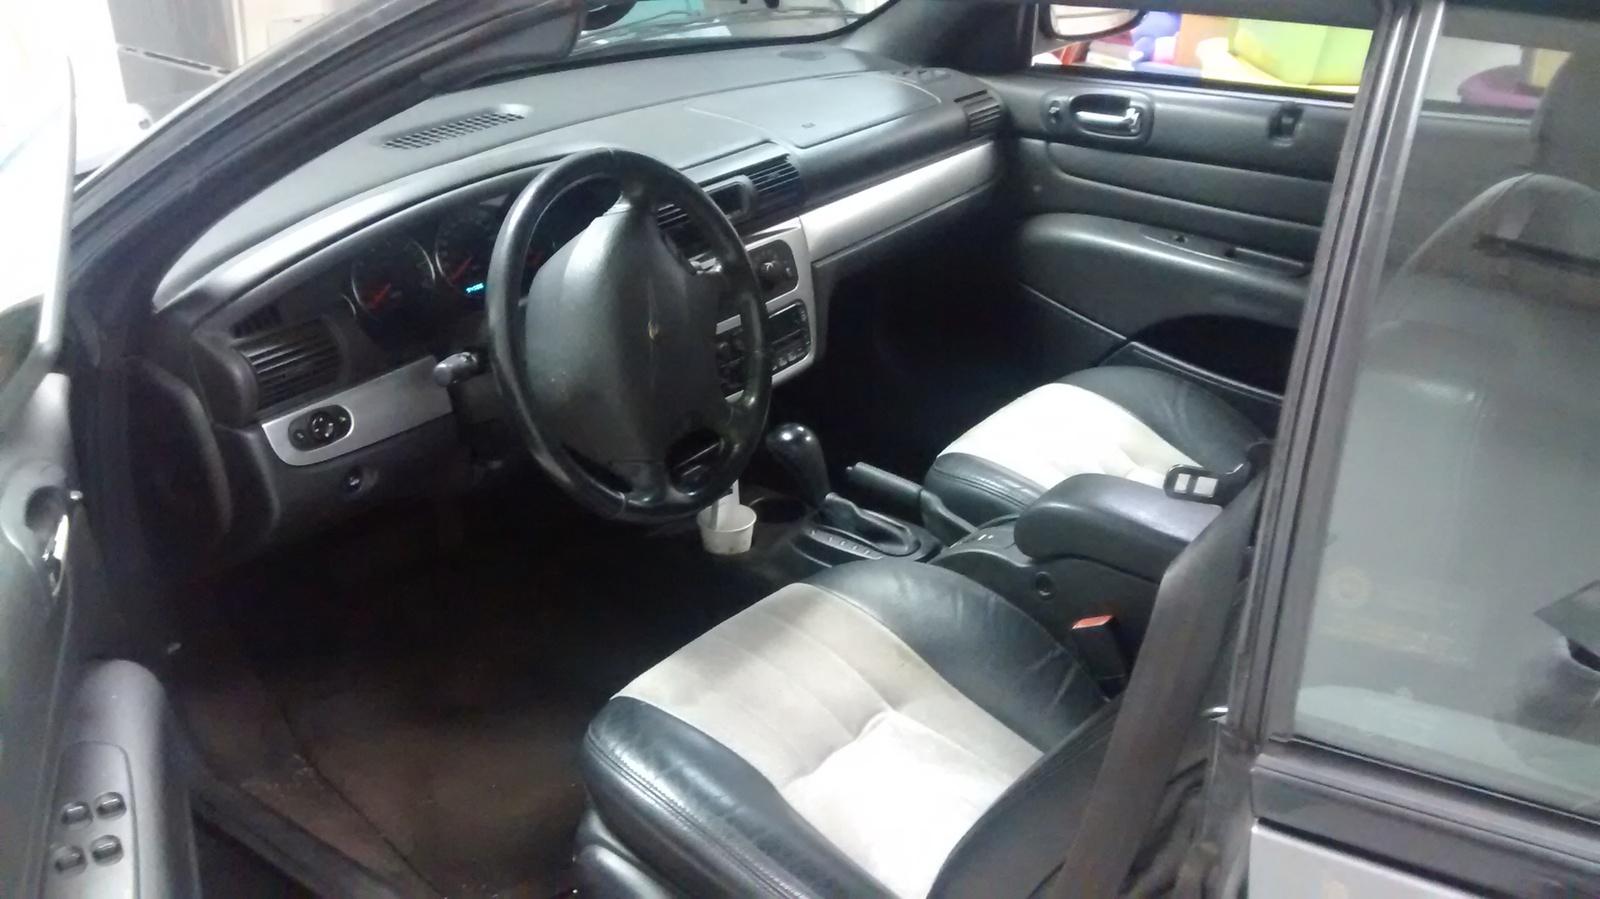 Picture Of 2004 Chrysler Sebring Touring Platinum Series Interior